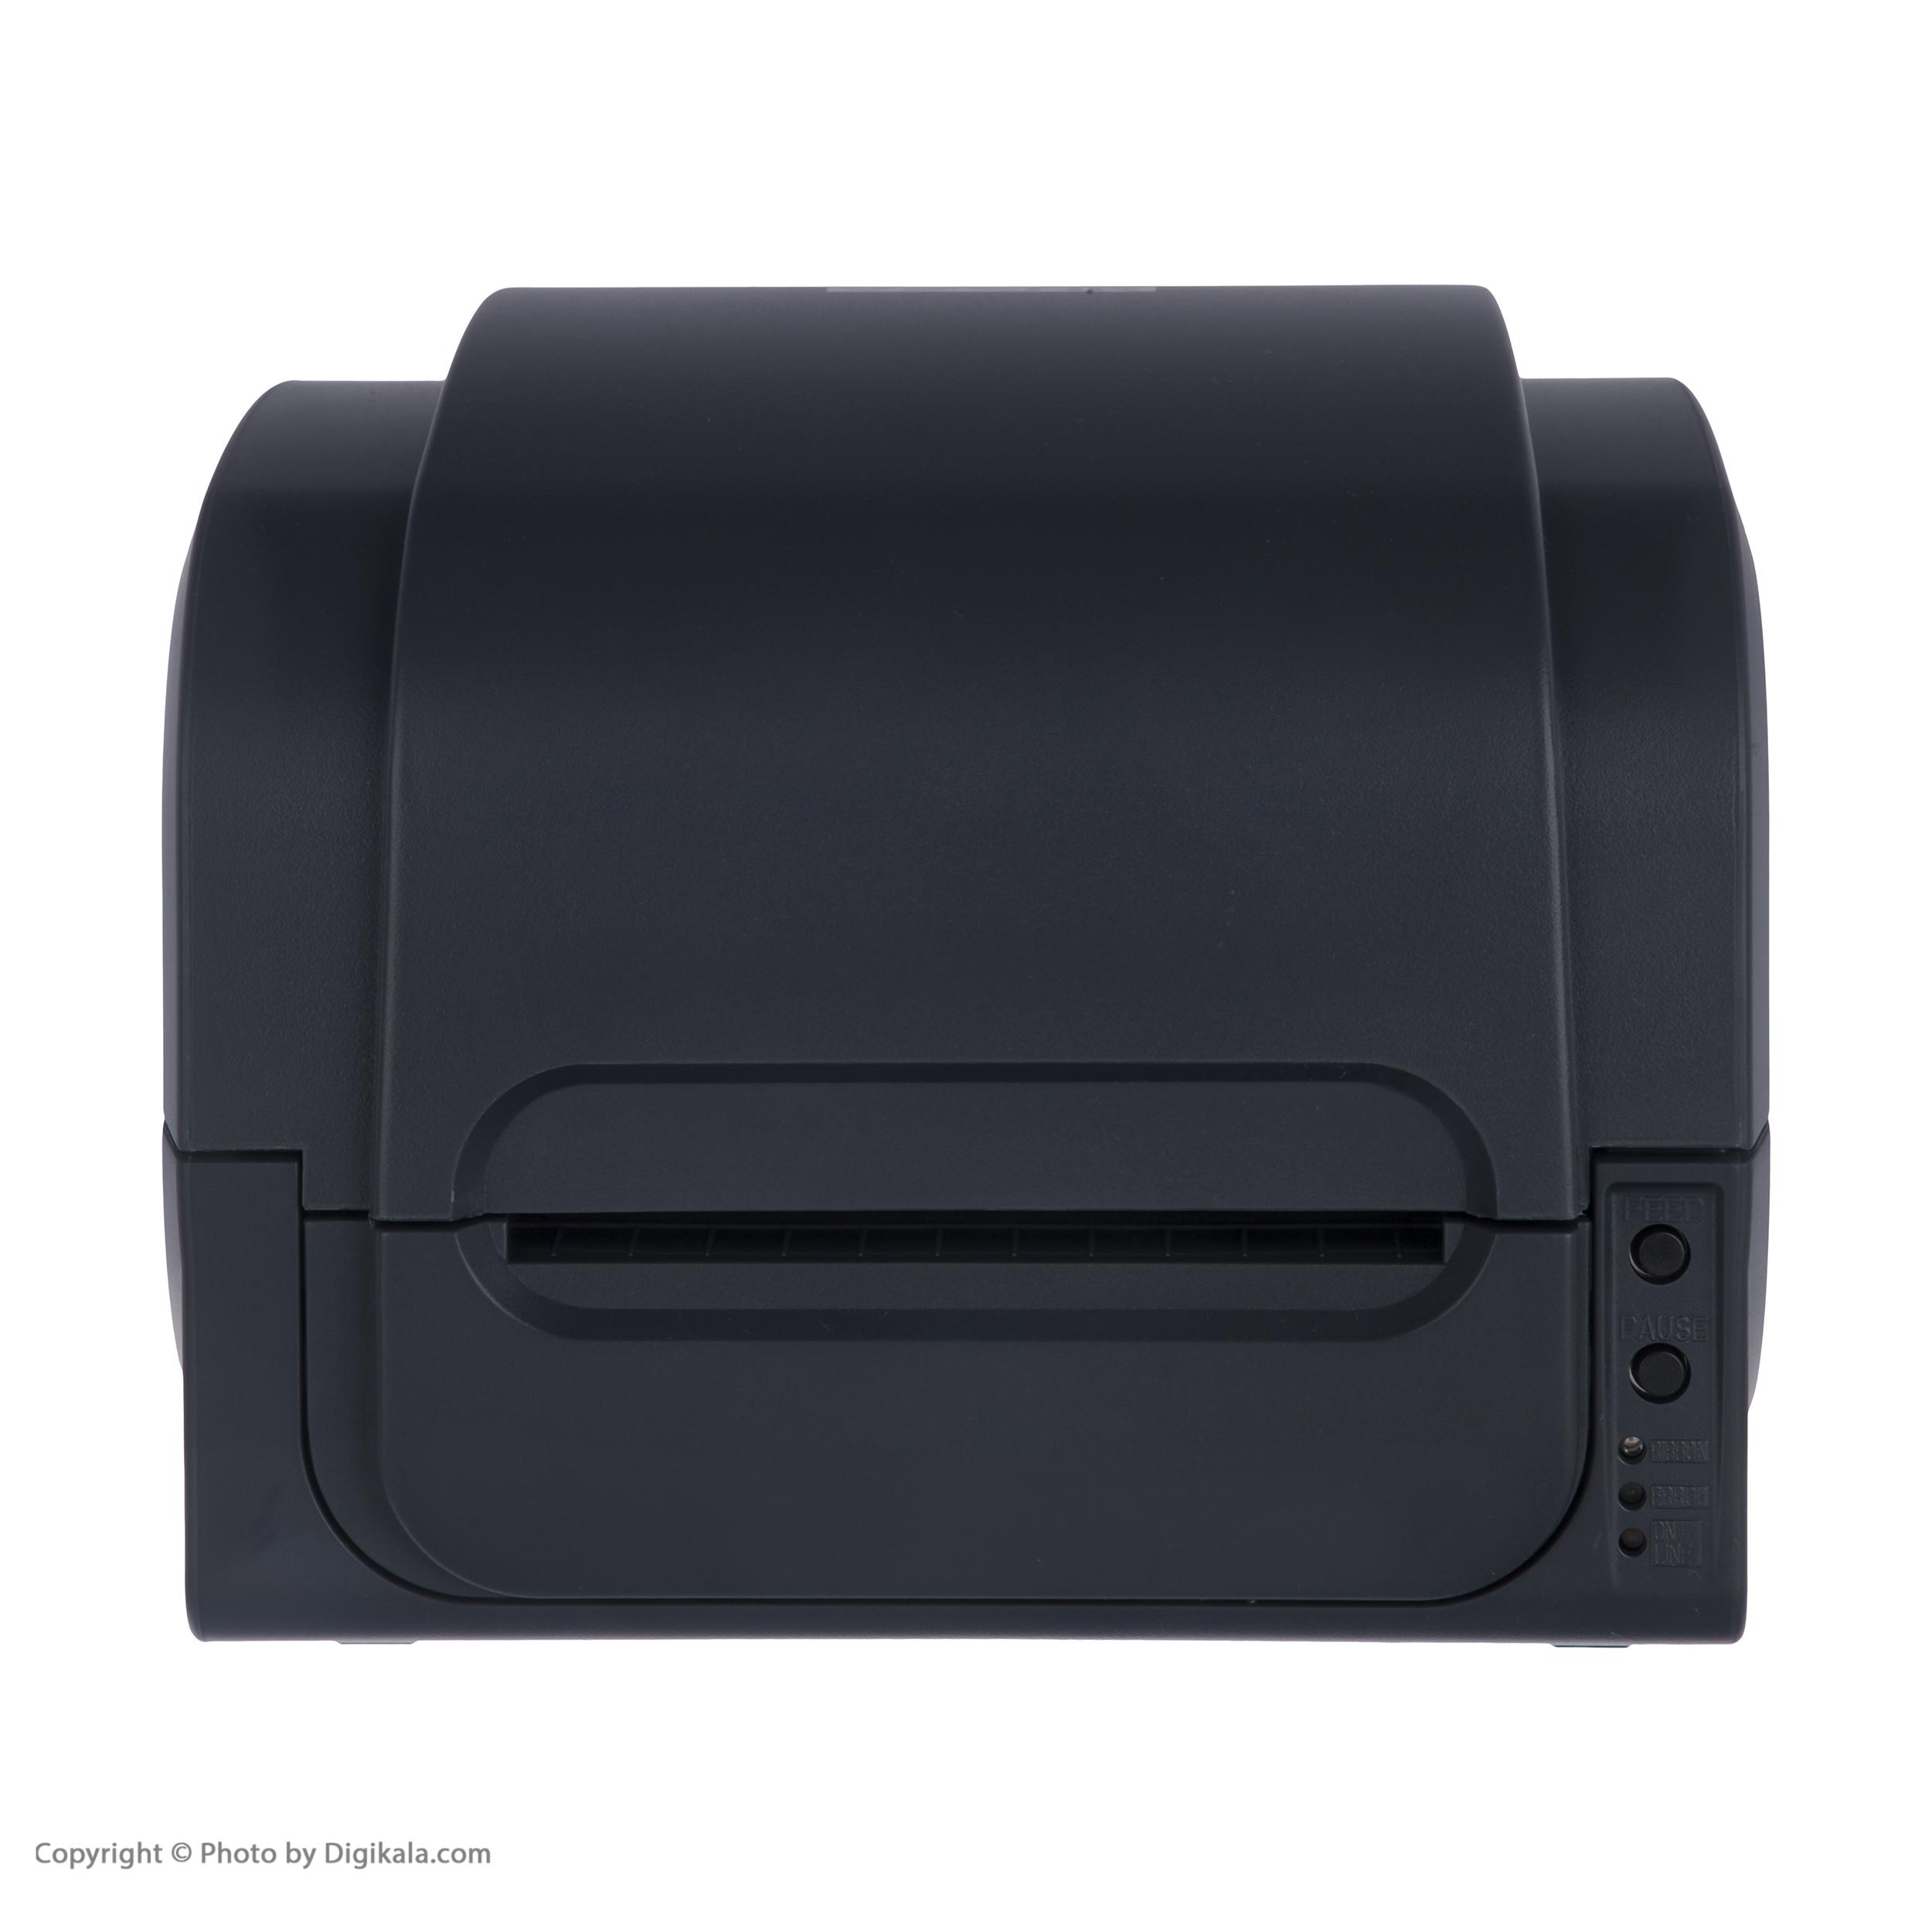 قیمت                      پرينتر لیبل زن اسكار مدل OBP 1125F